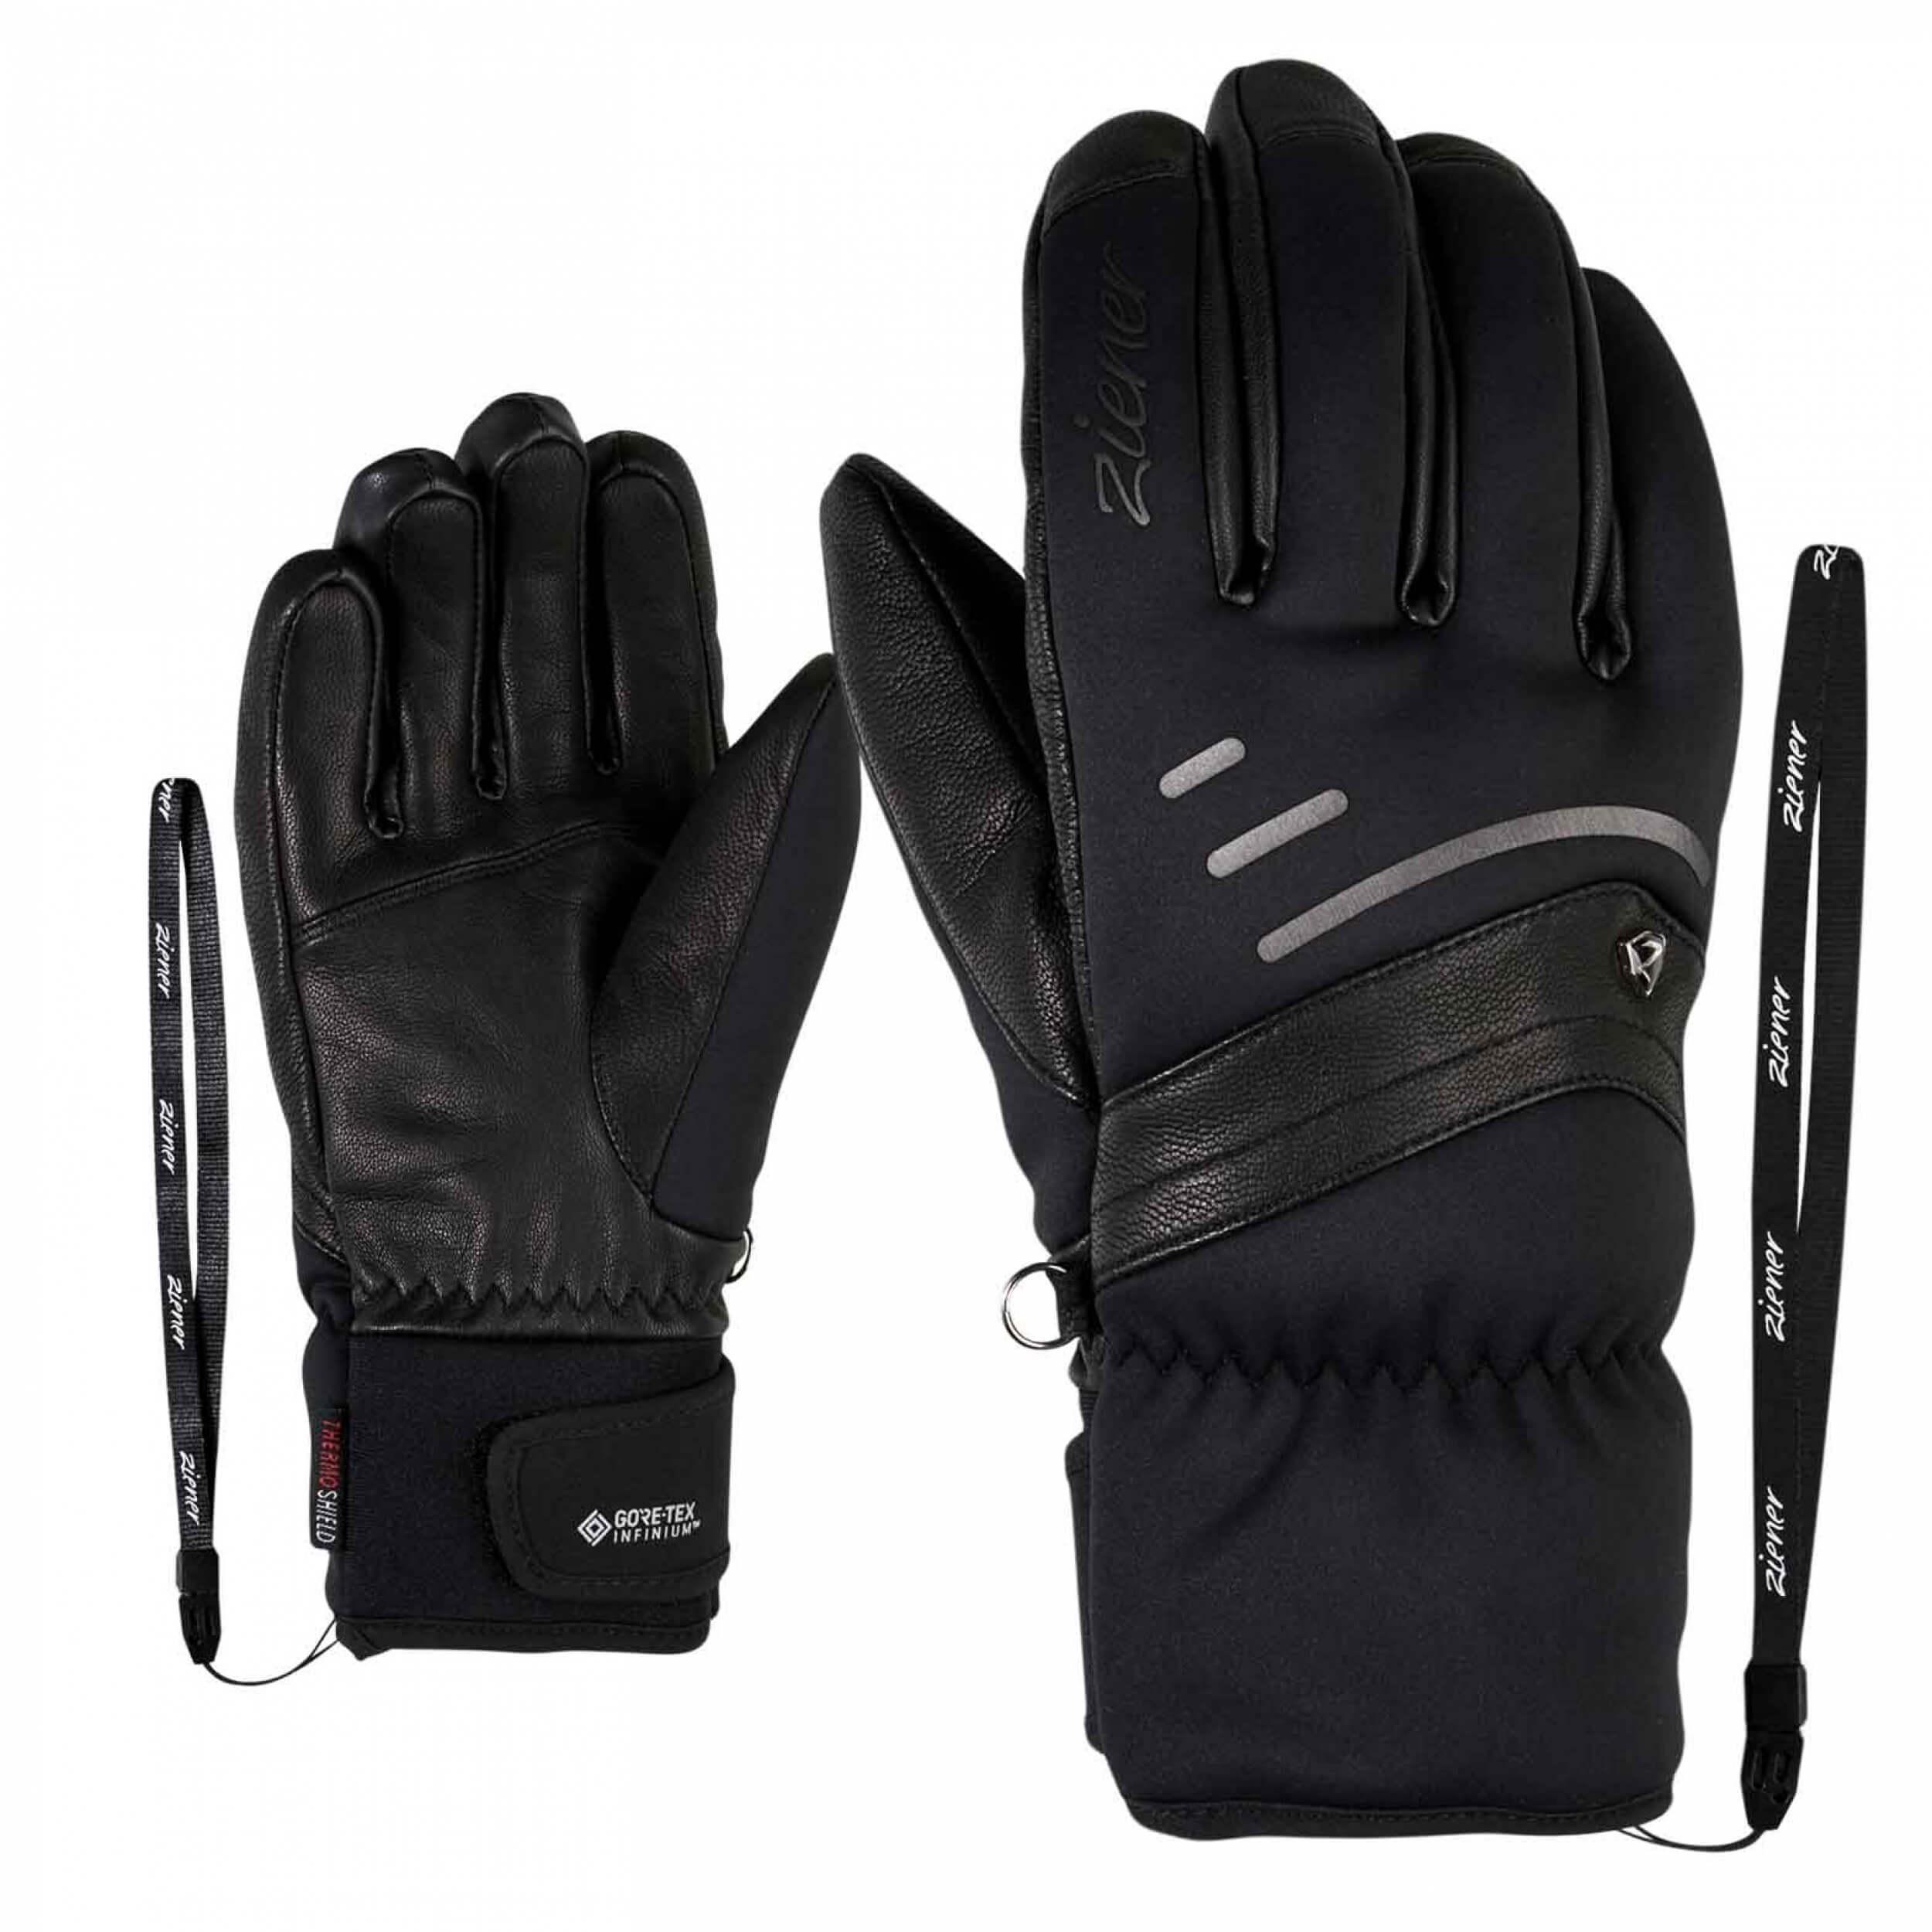 ZIENER Damen Ski Handschuhe Korall GORETEX schwarz 12